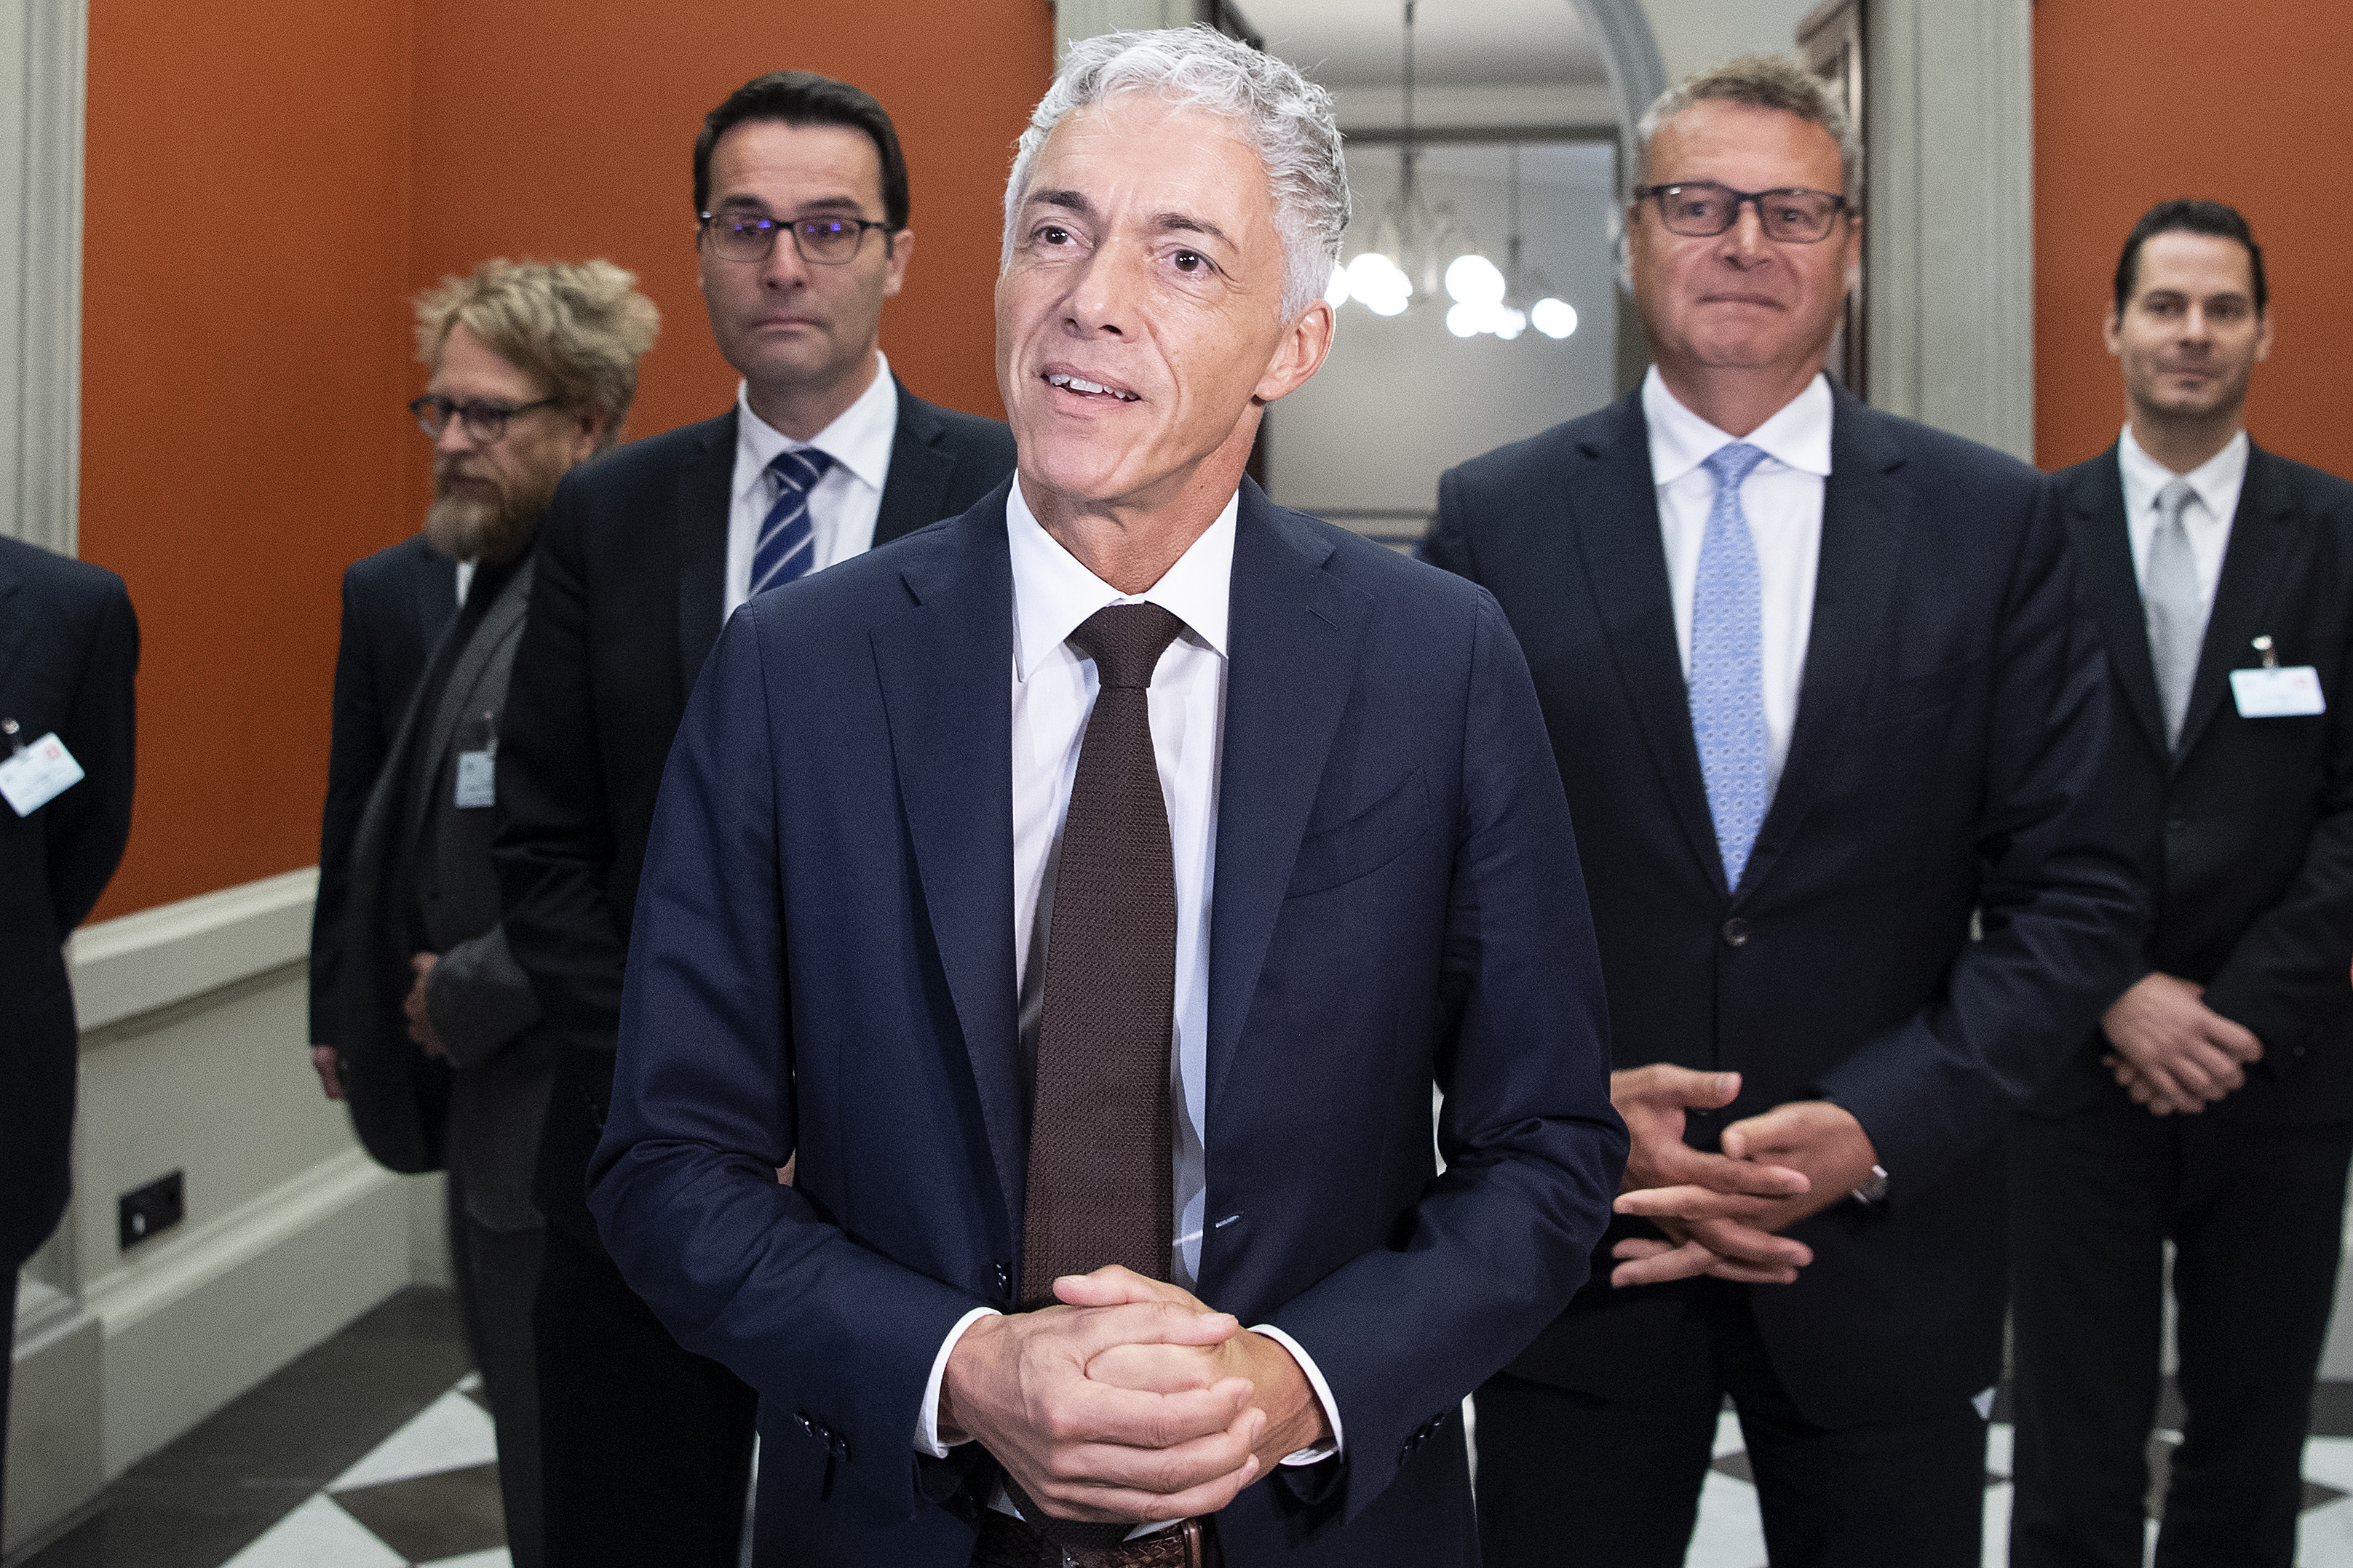 Swiss prosecutor faces impeachment process over FIFA case